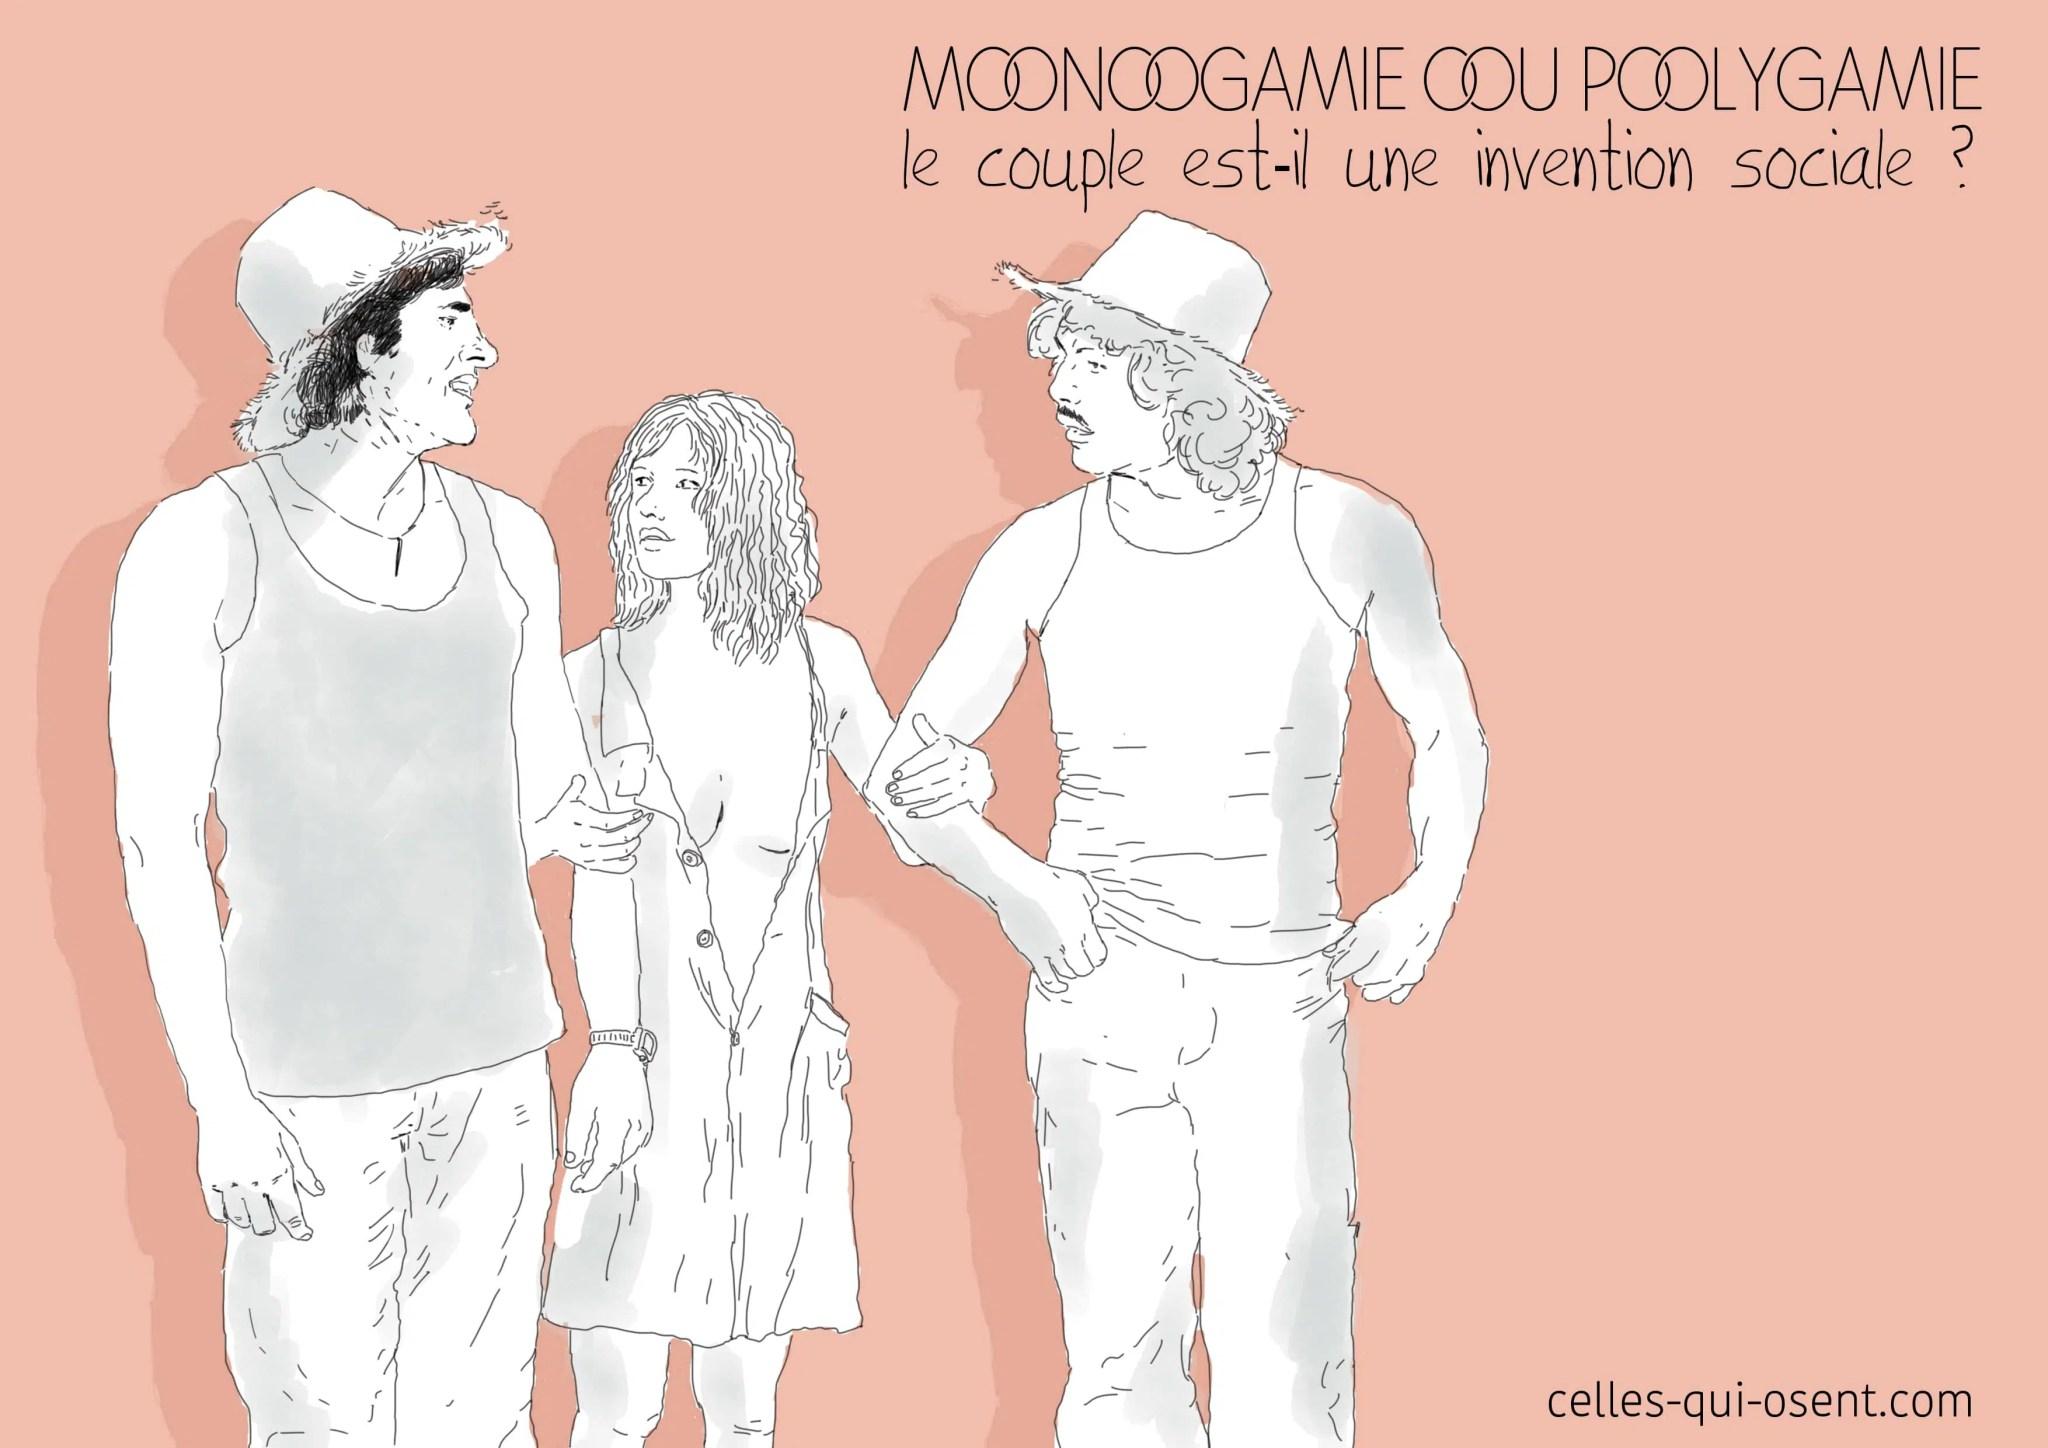 couples-monogamie-polygamie-celles-qui-osent-CQO